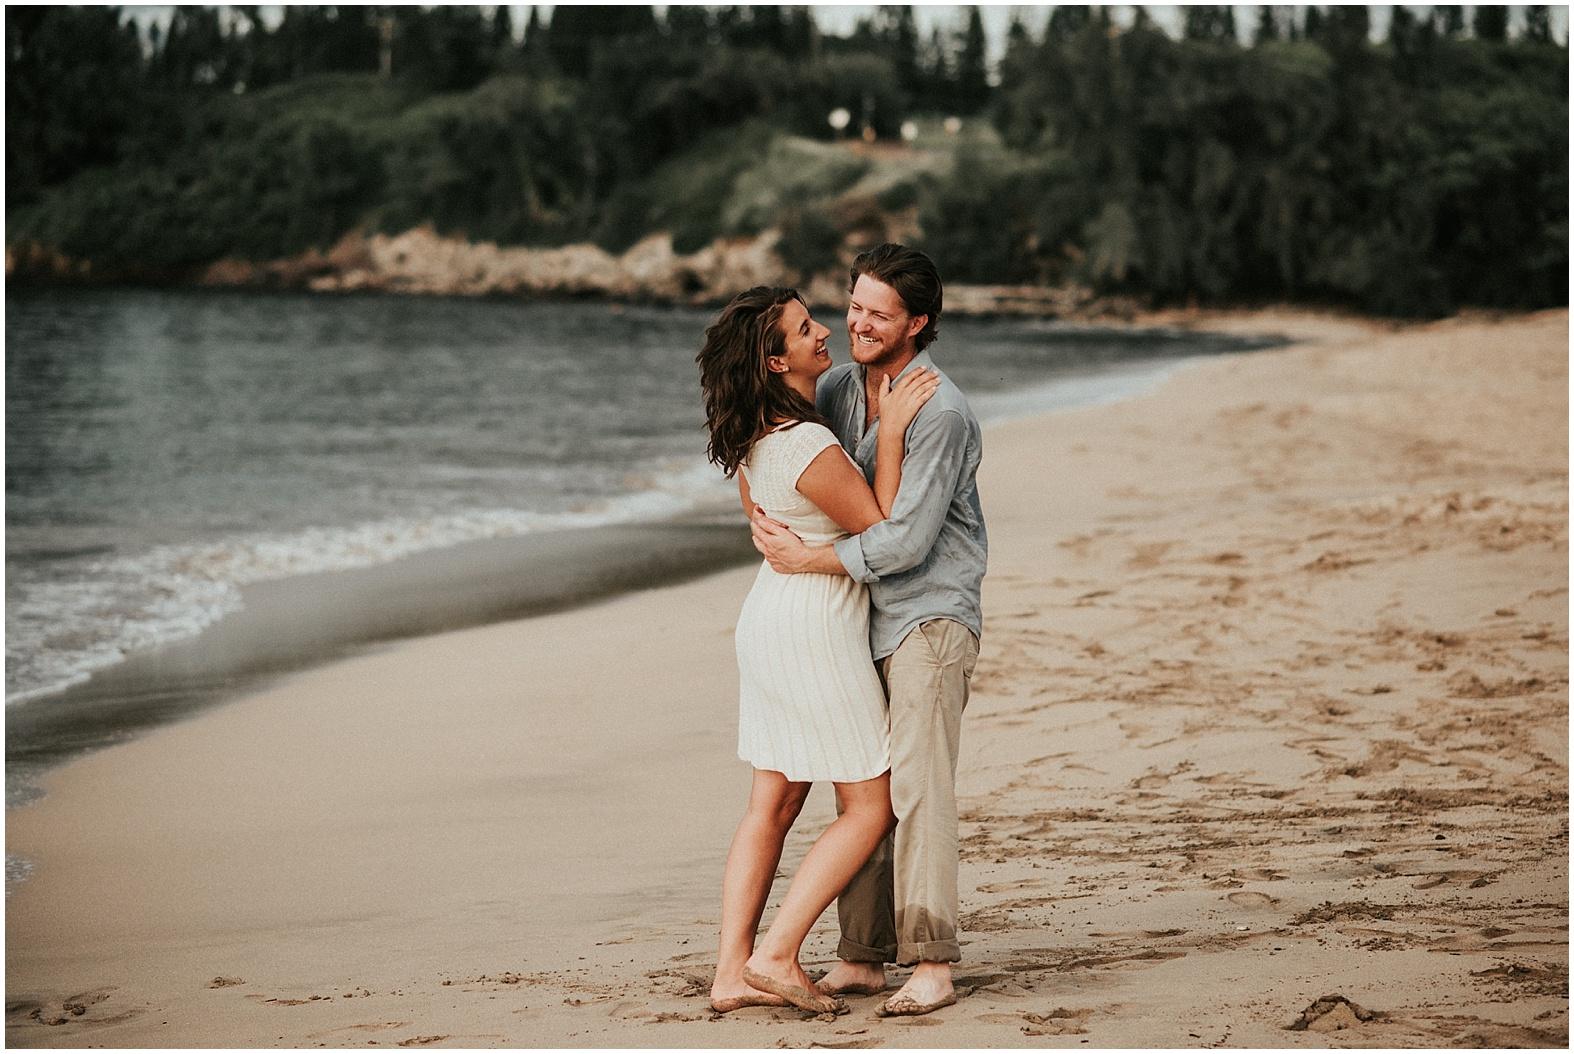 Maui family photography8.jpg